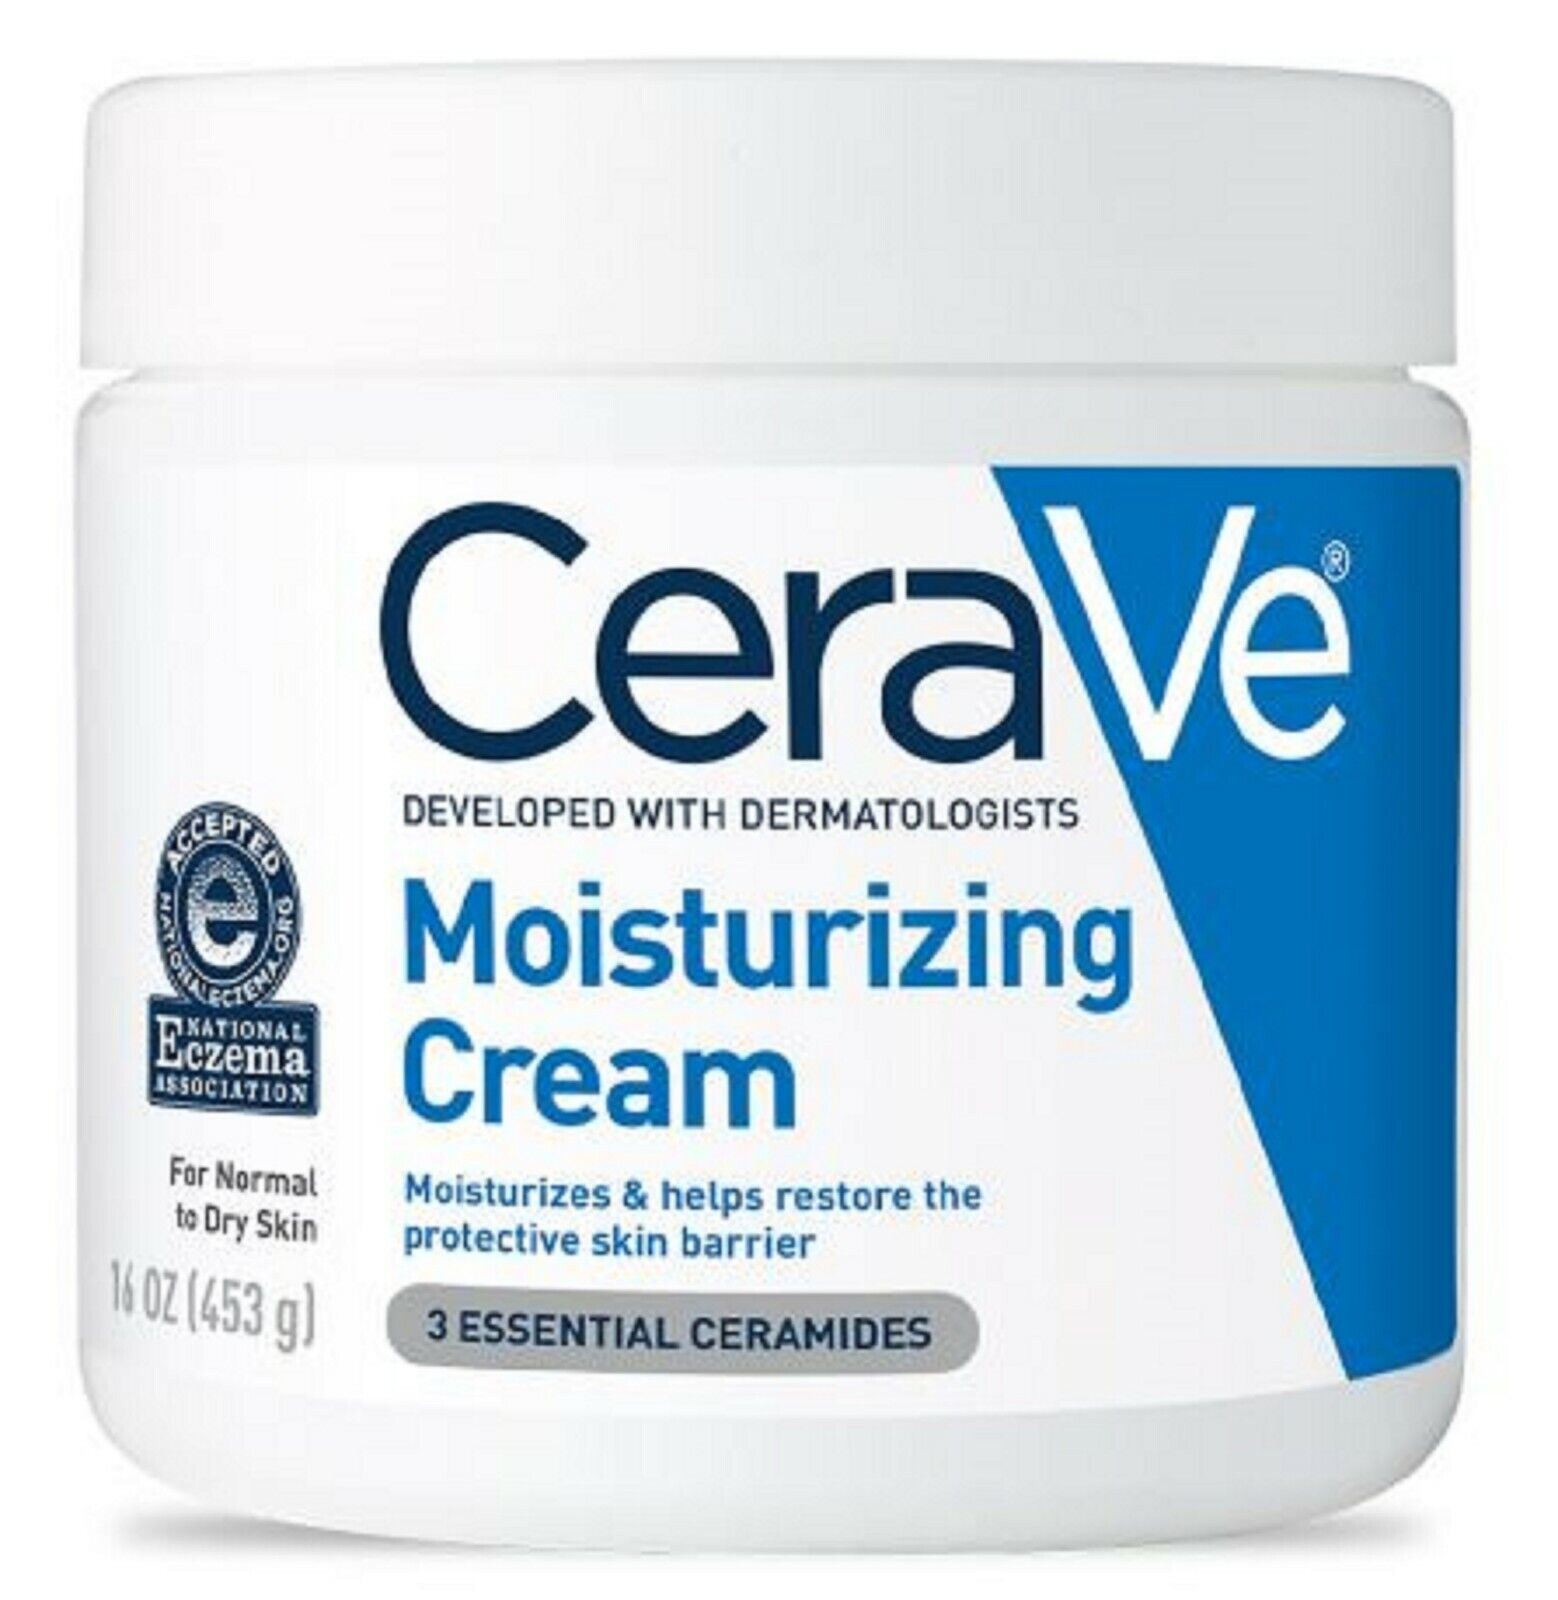 CeraVe Moisturizing Cream - 16 oz